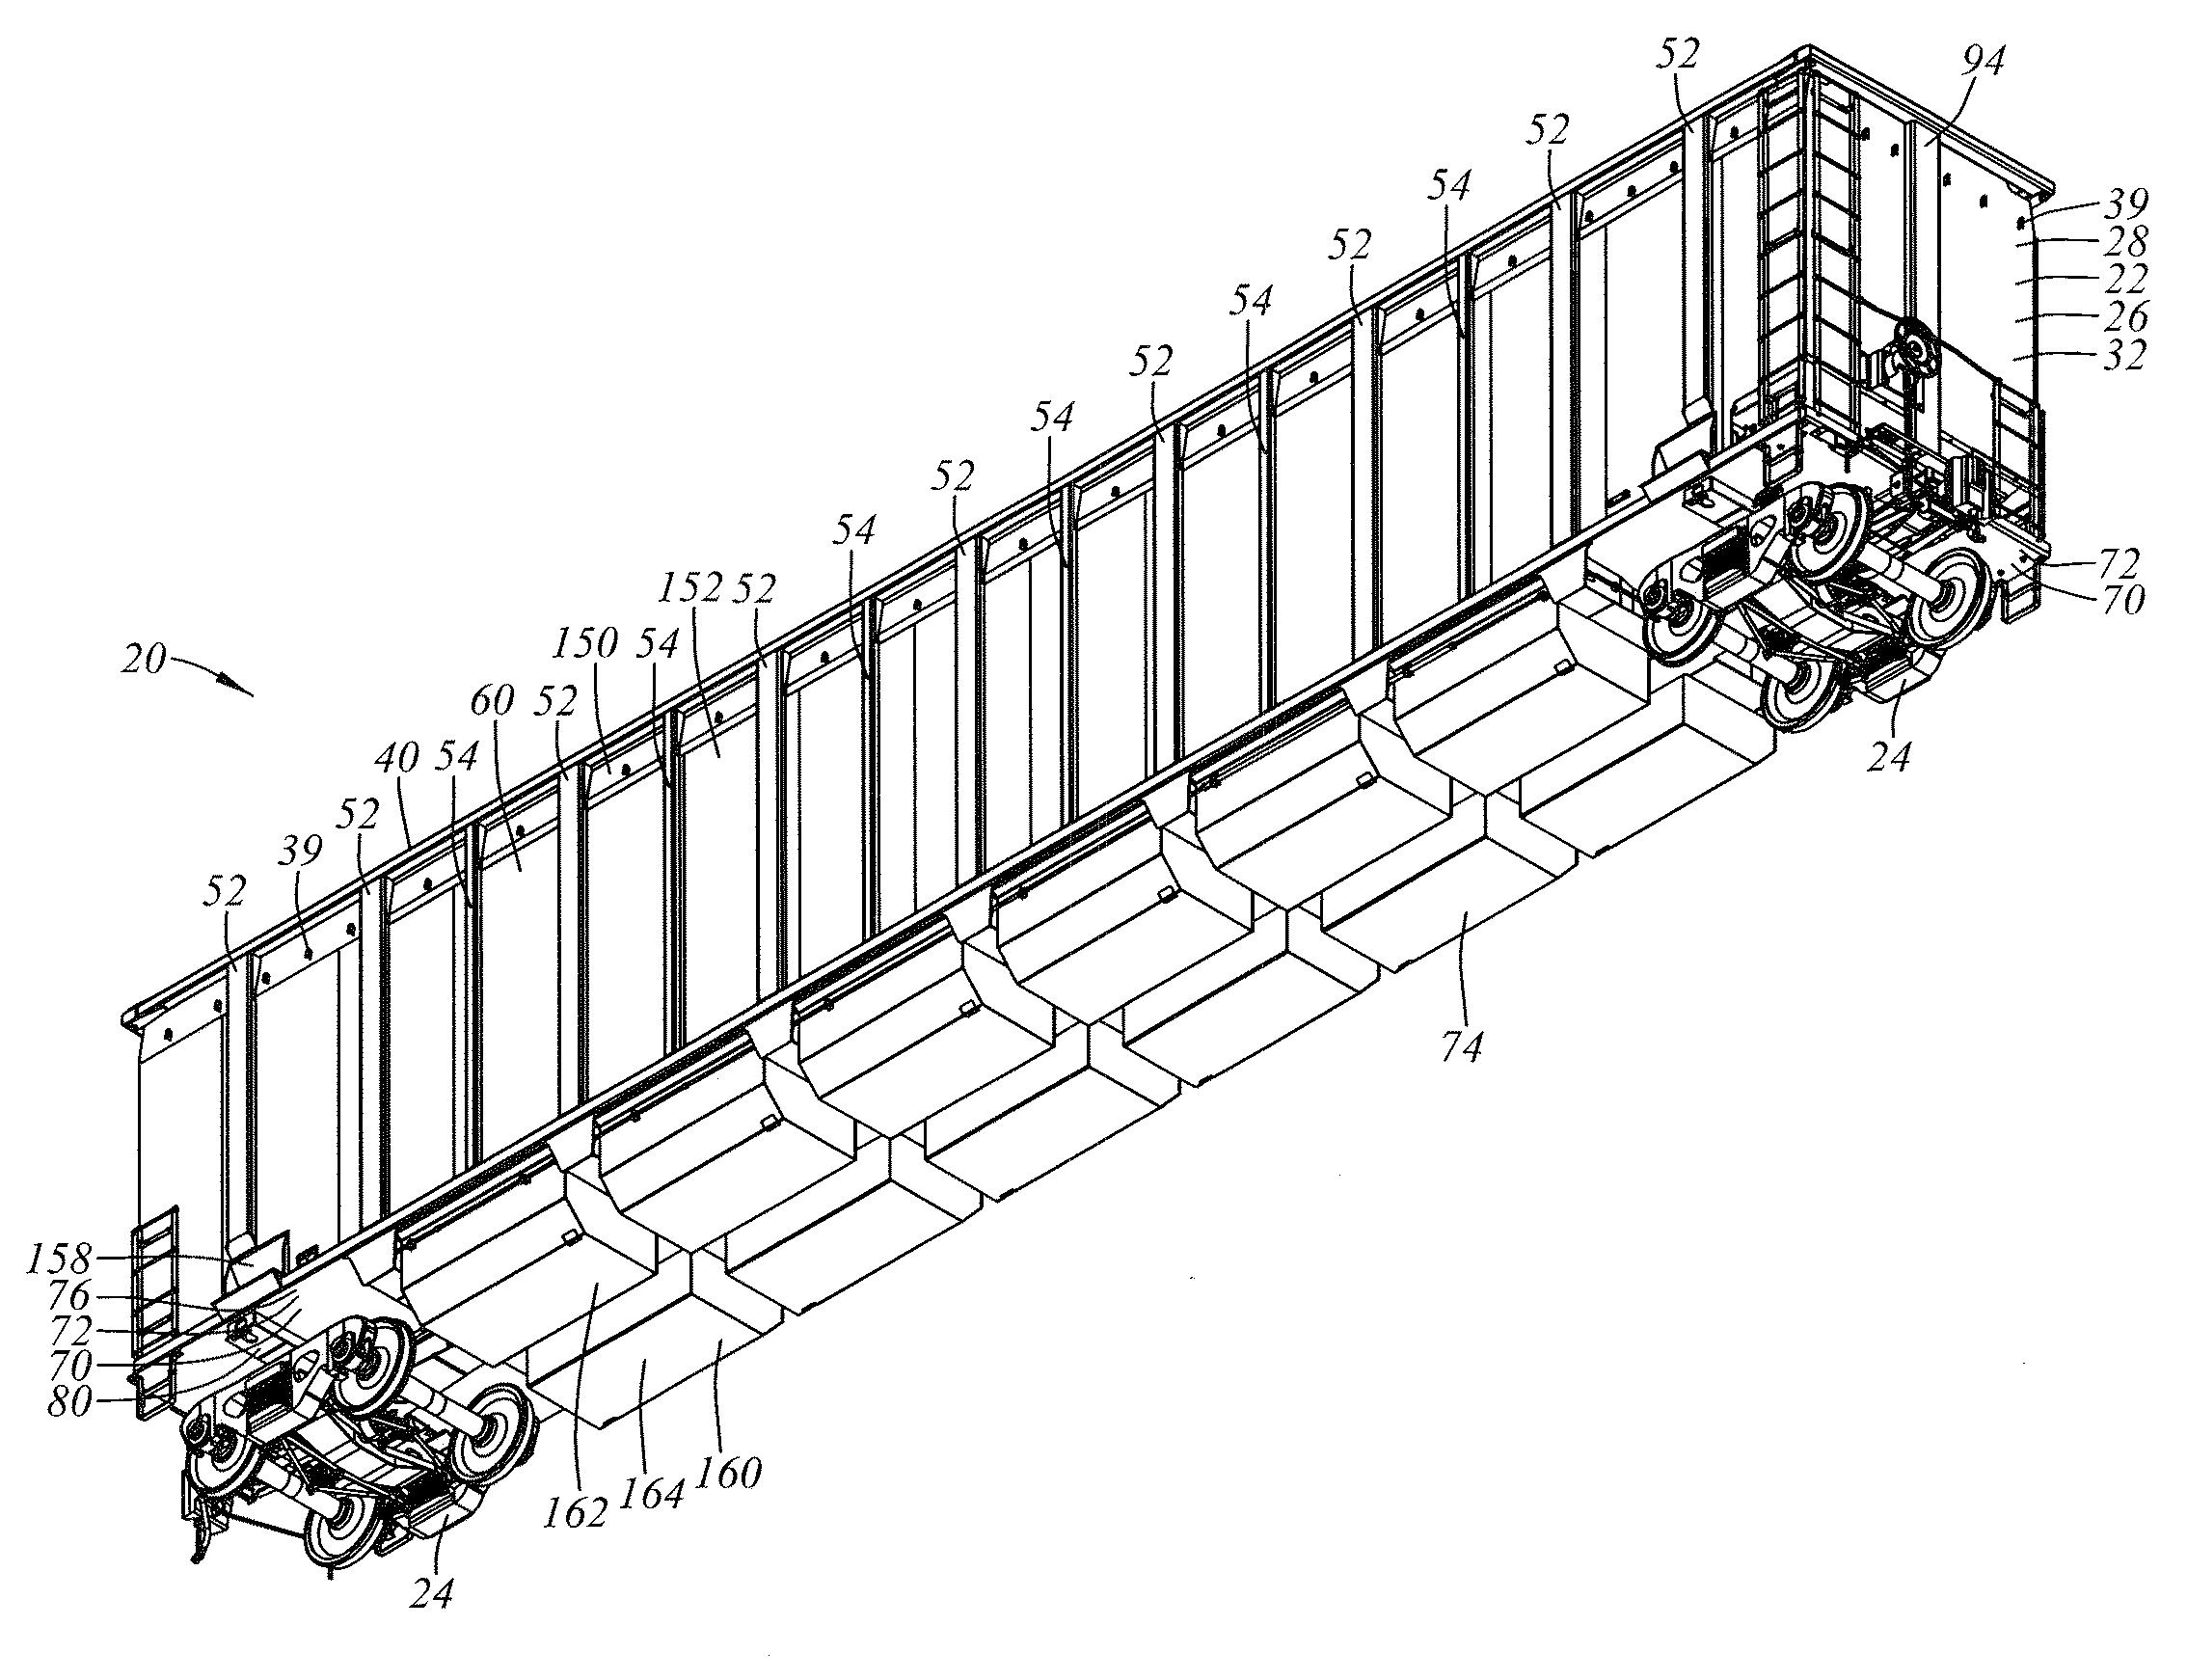 diagram of gondola patent us20100011987 - railroad gondola car structure ...